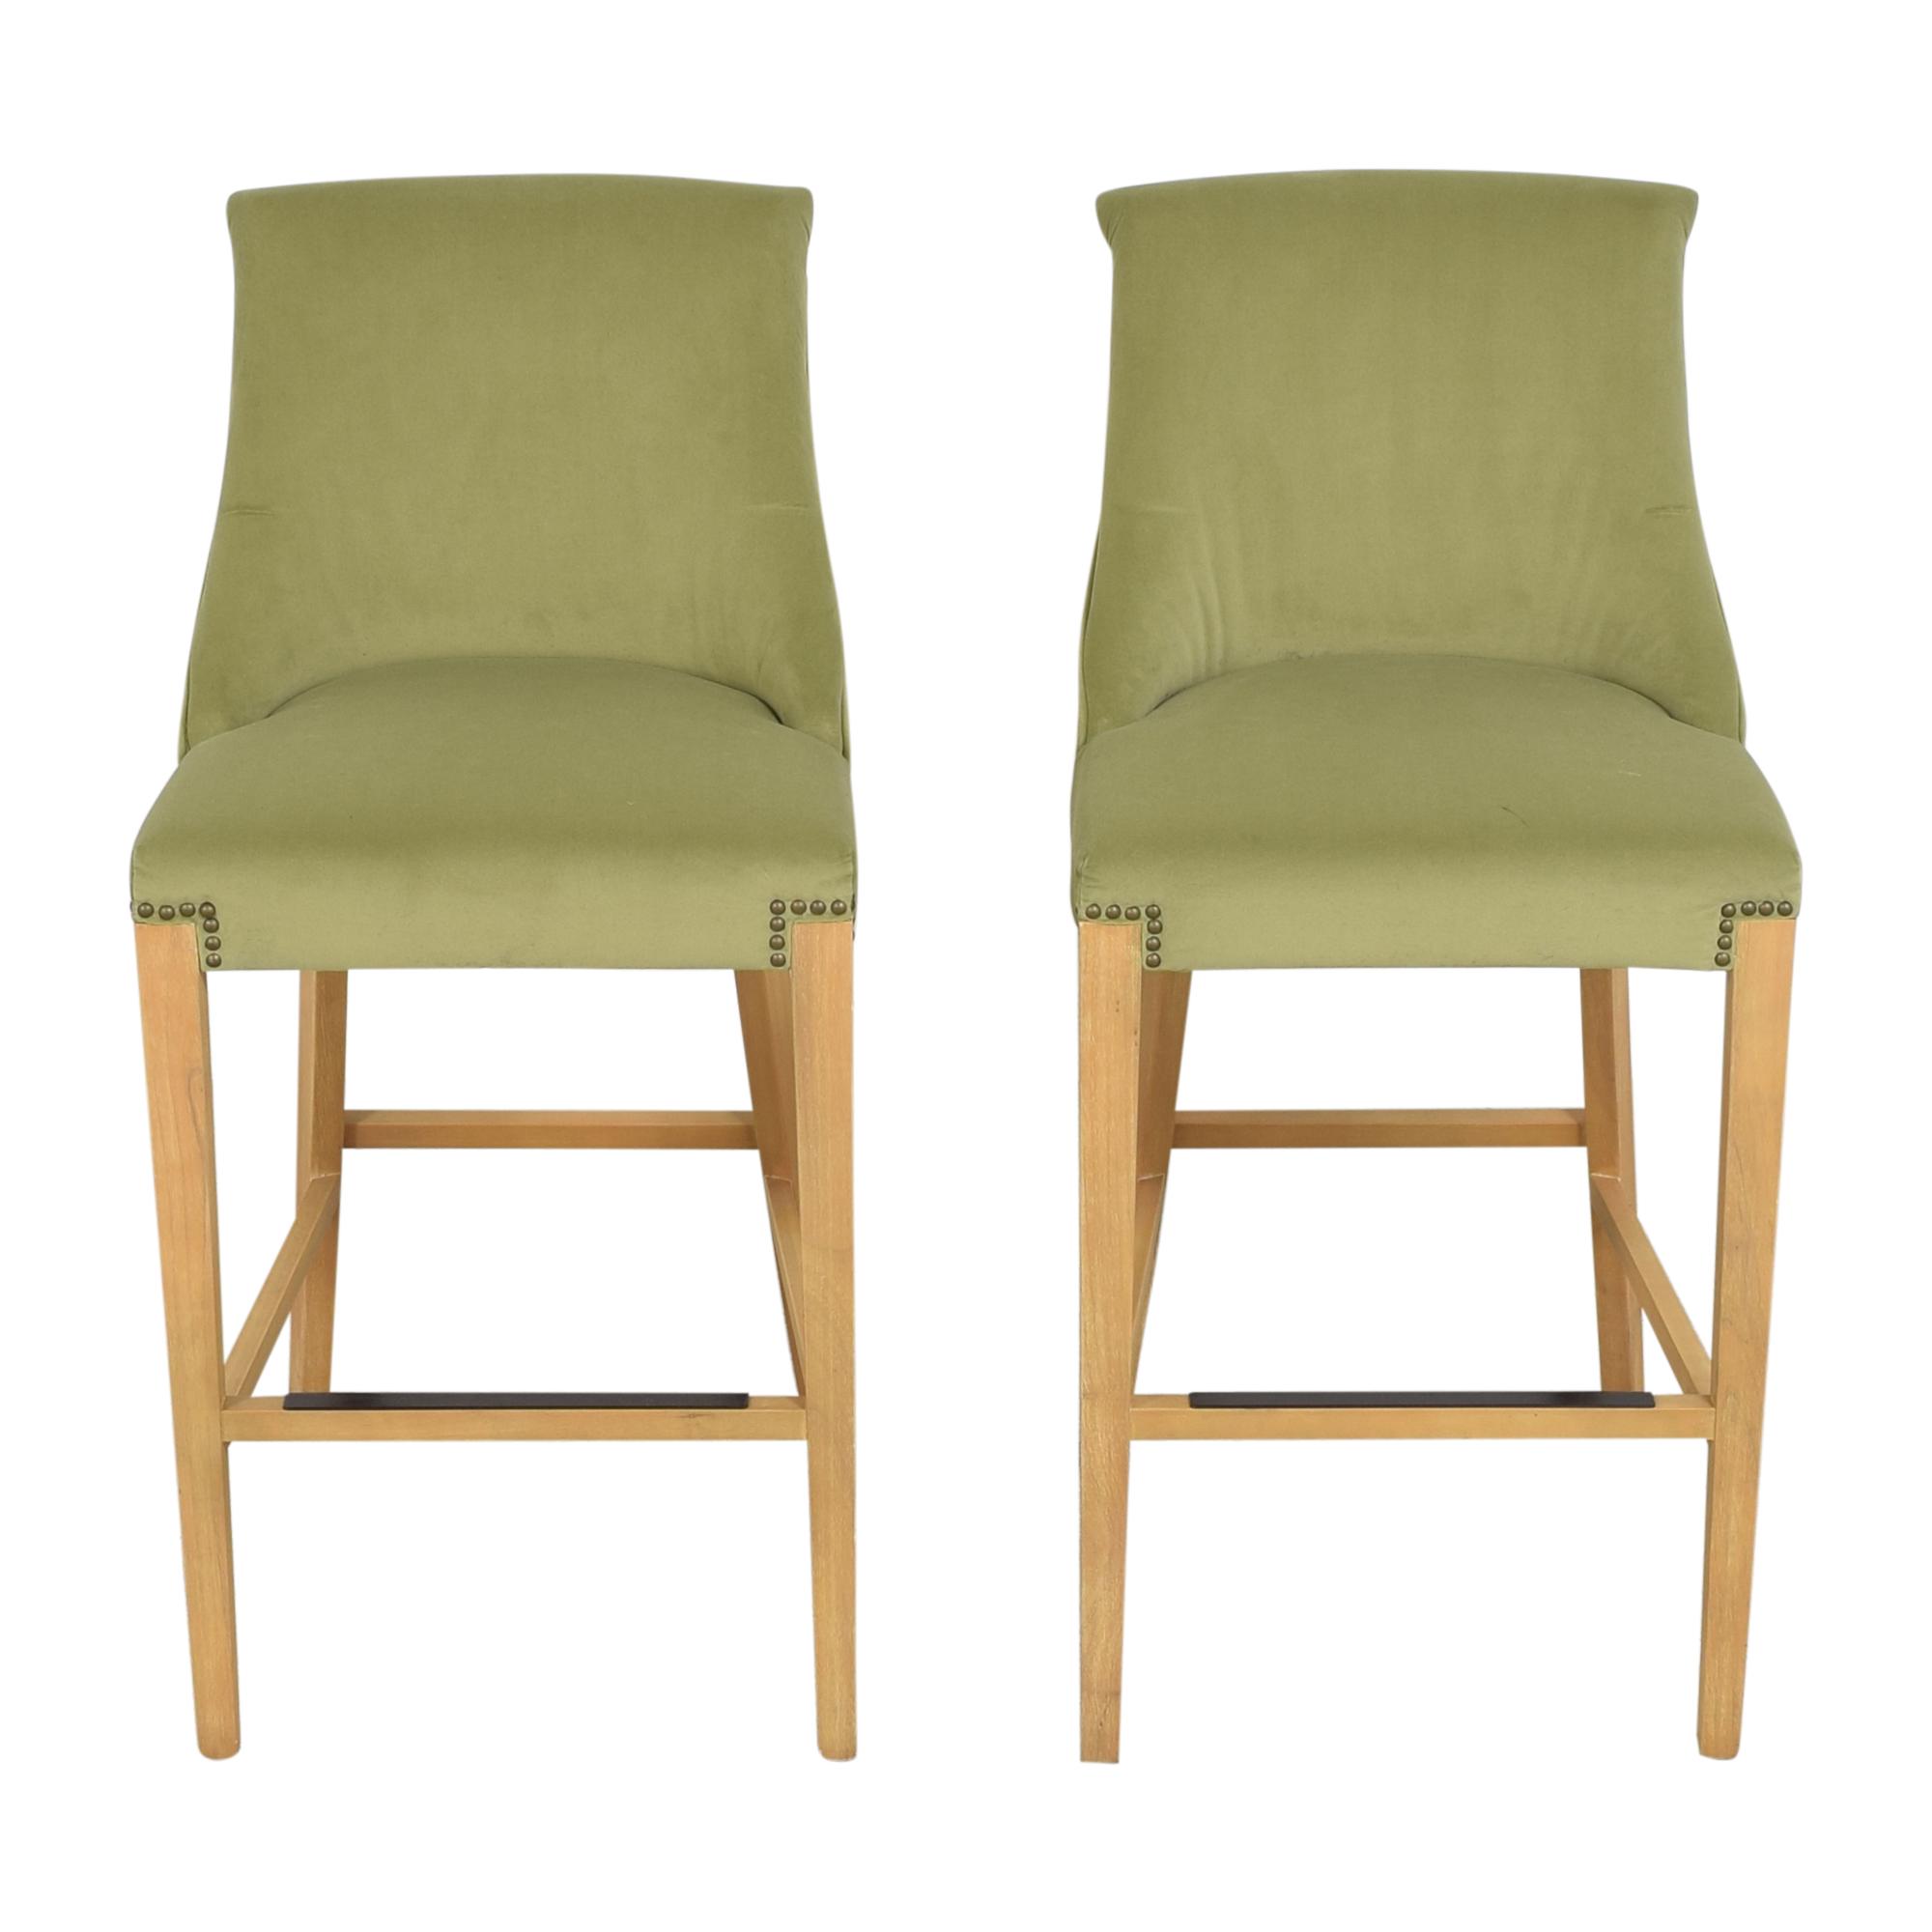 Jason Furniture Jason Furniture Nailhead Trim Bar Stools price